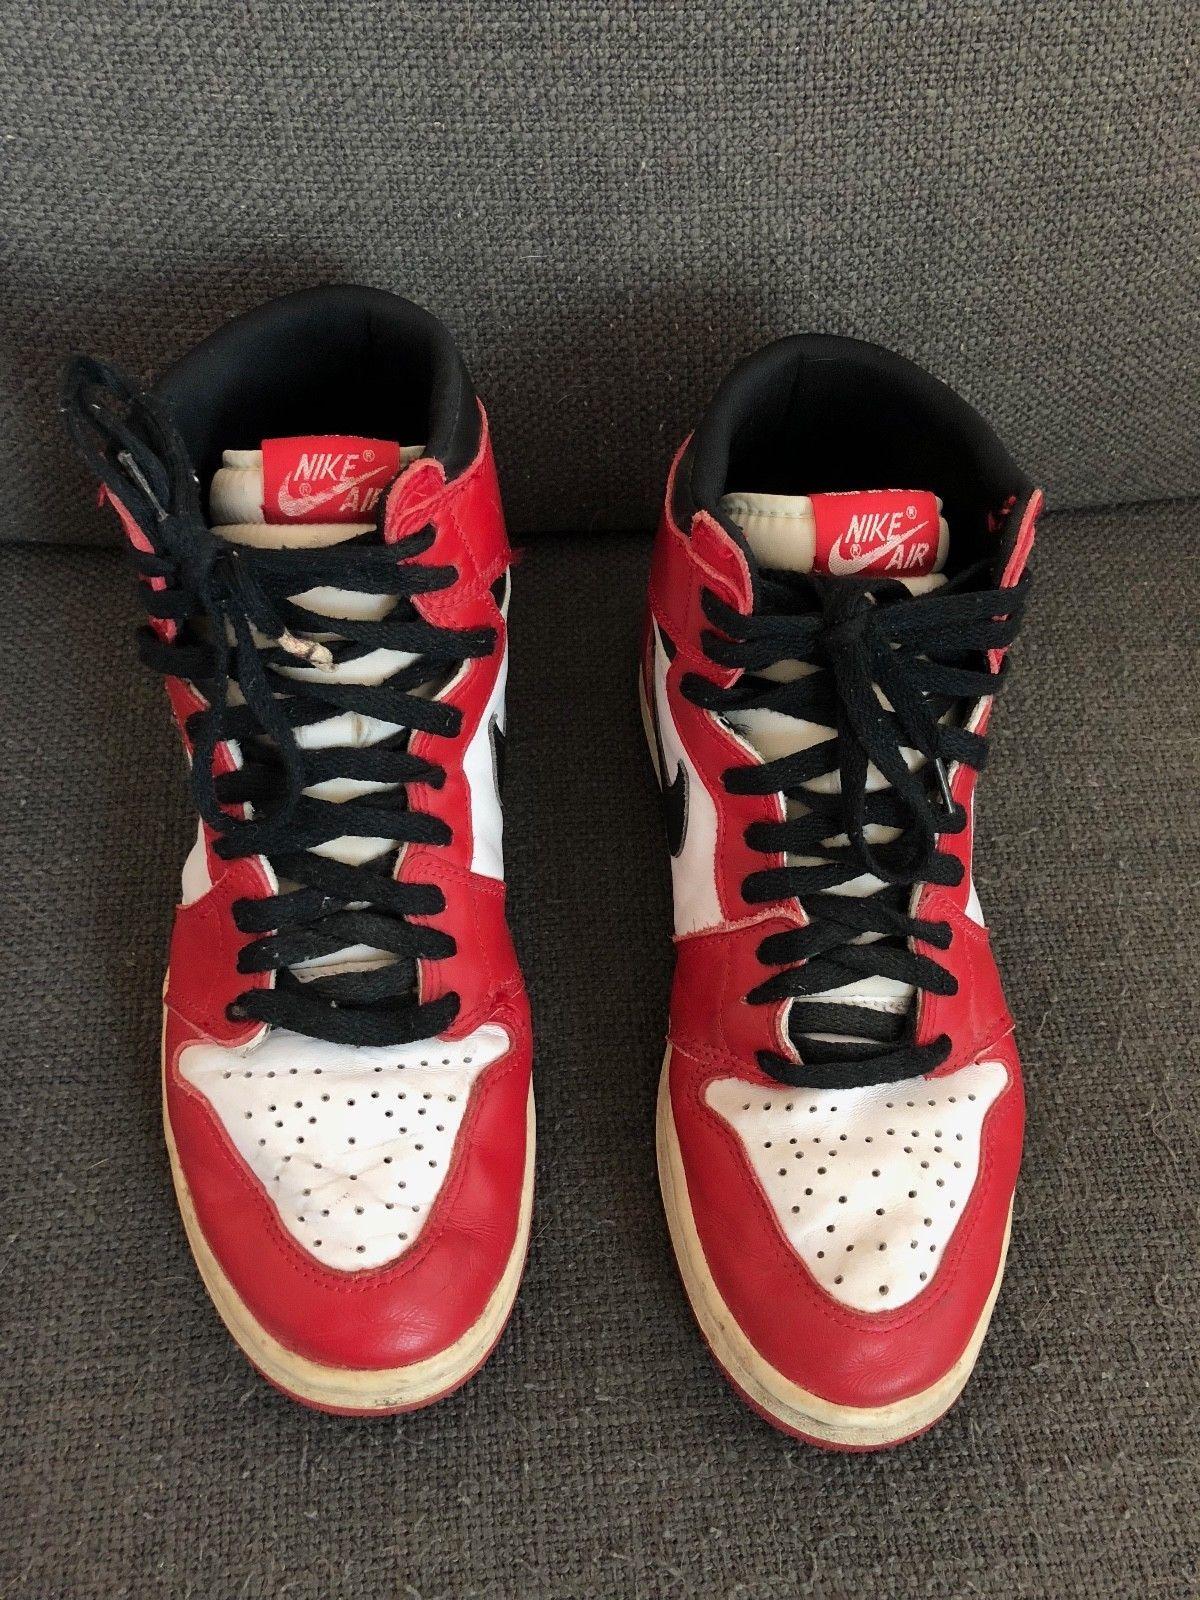 331a3c29008 Jordan 1, Size 10, Shape, The Originals, Sneakers Nike, Vintage Nike